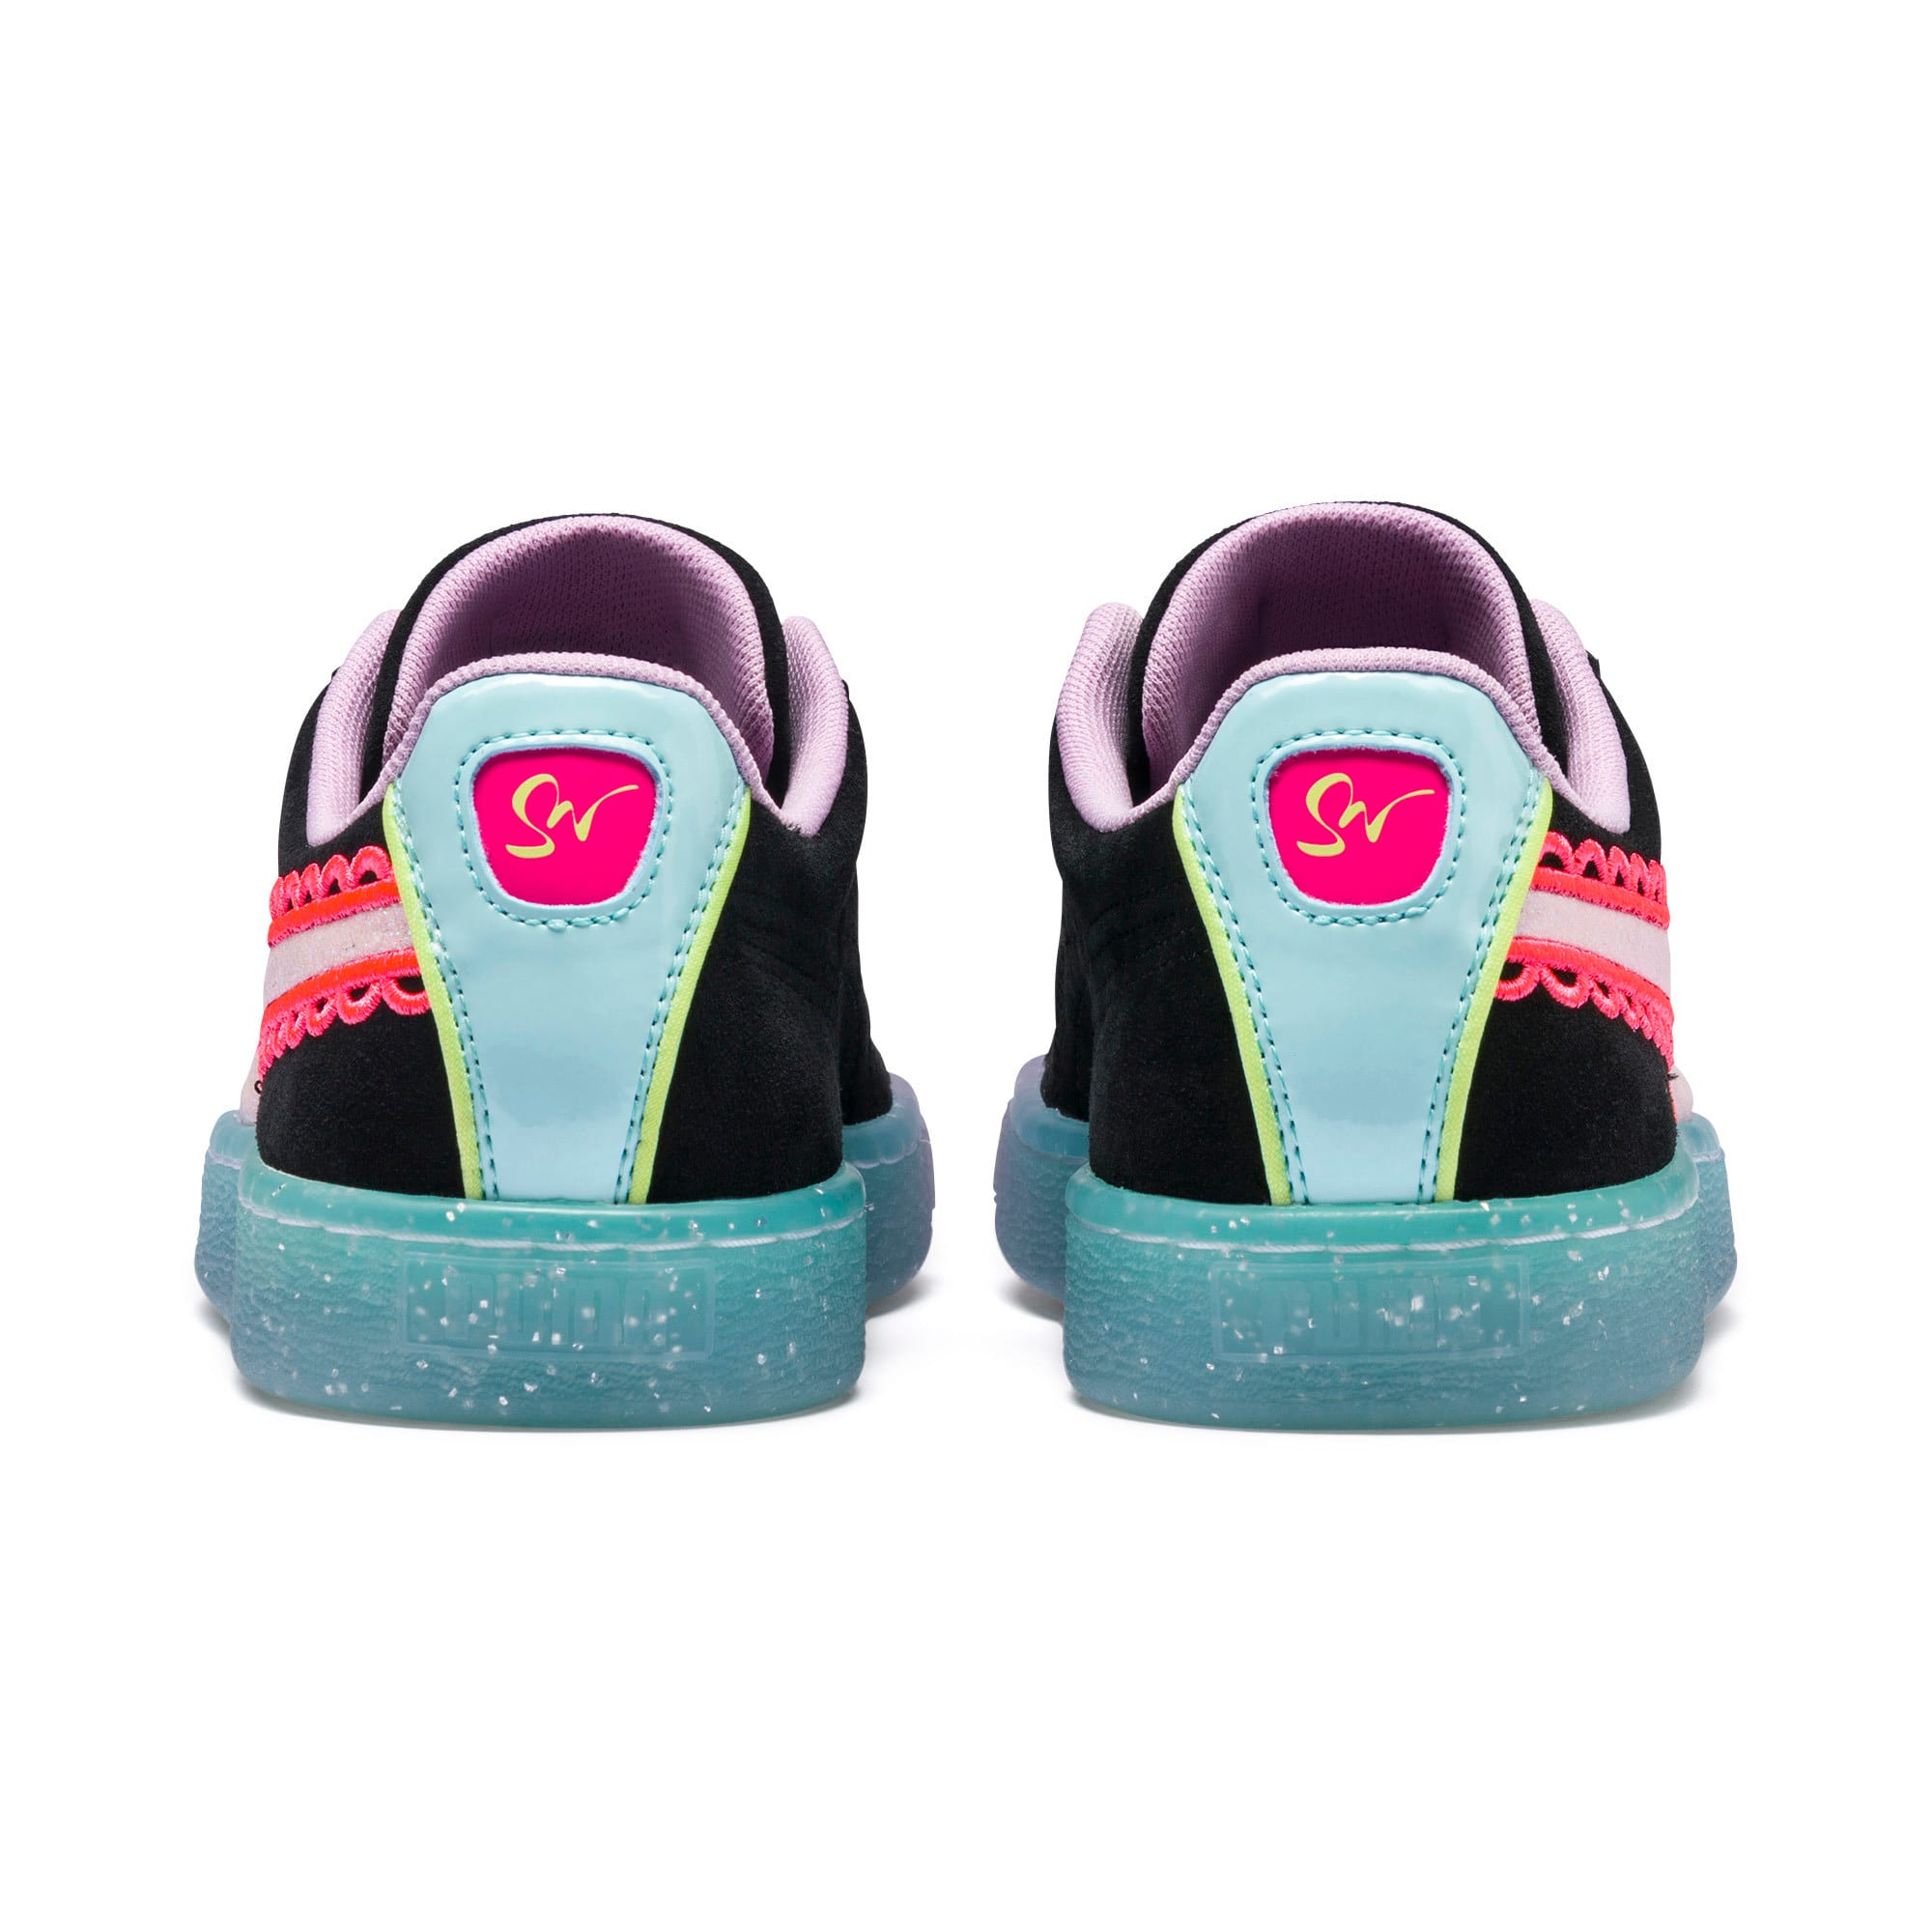 Thumbnail 4 of PUMA x SOPHIA WEBSTER Suede Women's Sneakers, Puma Black-Fiery Coral, medium